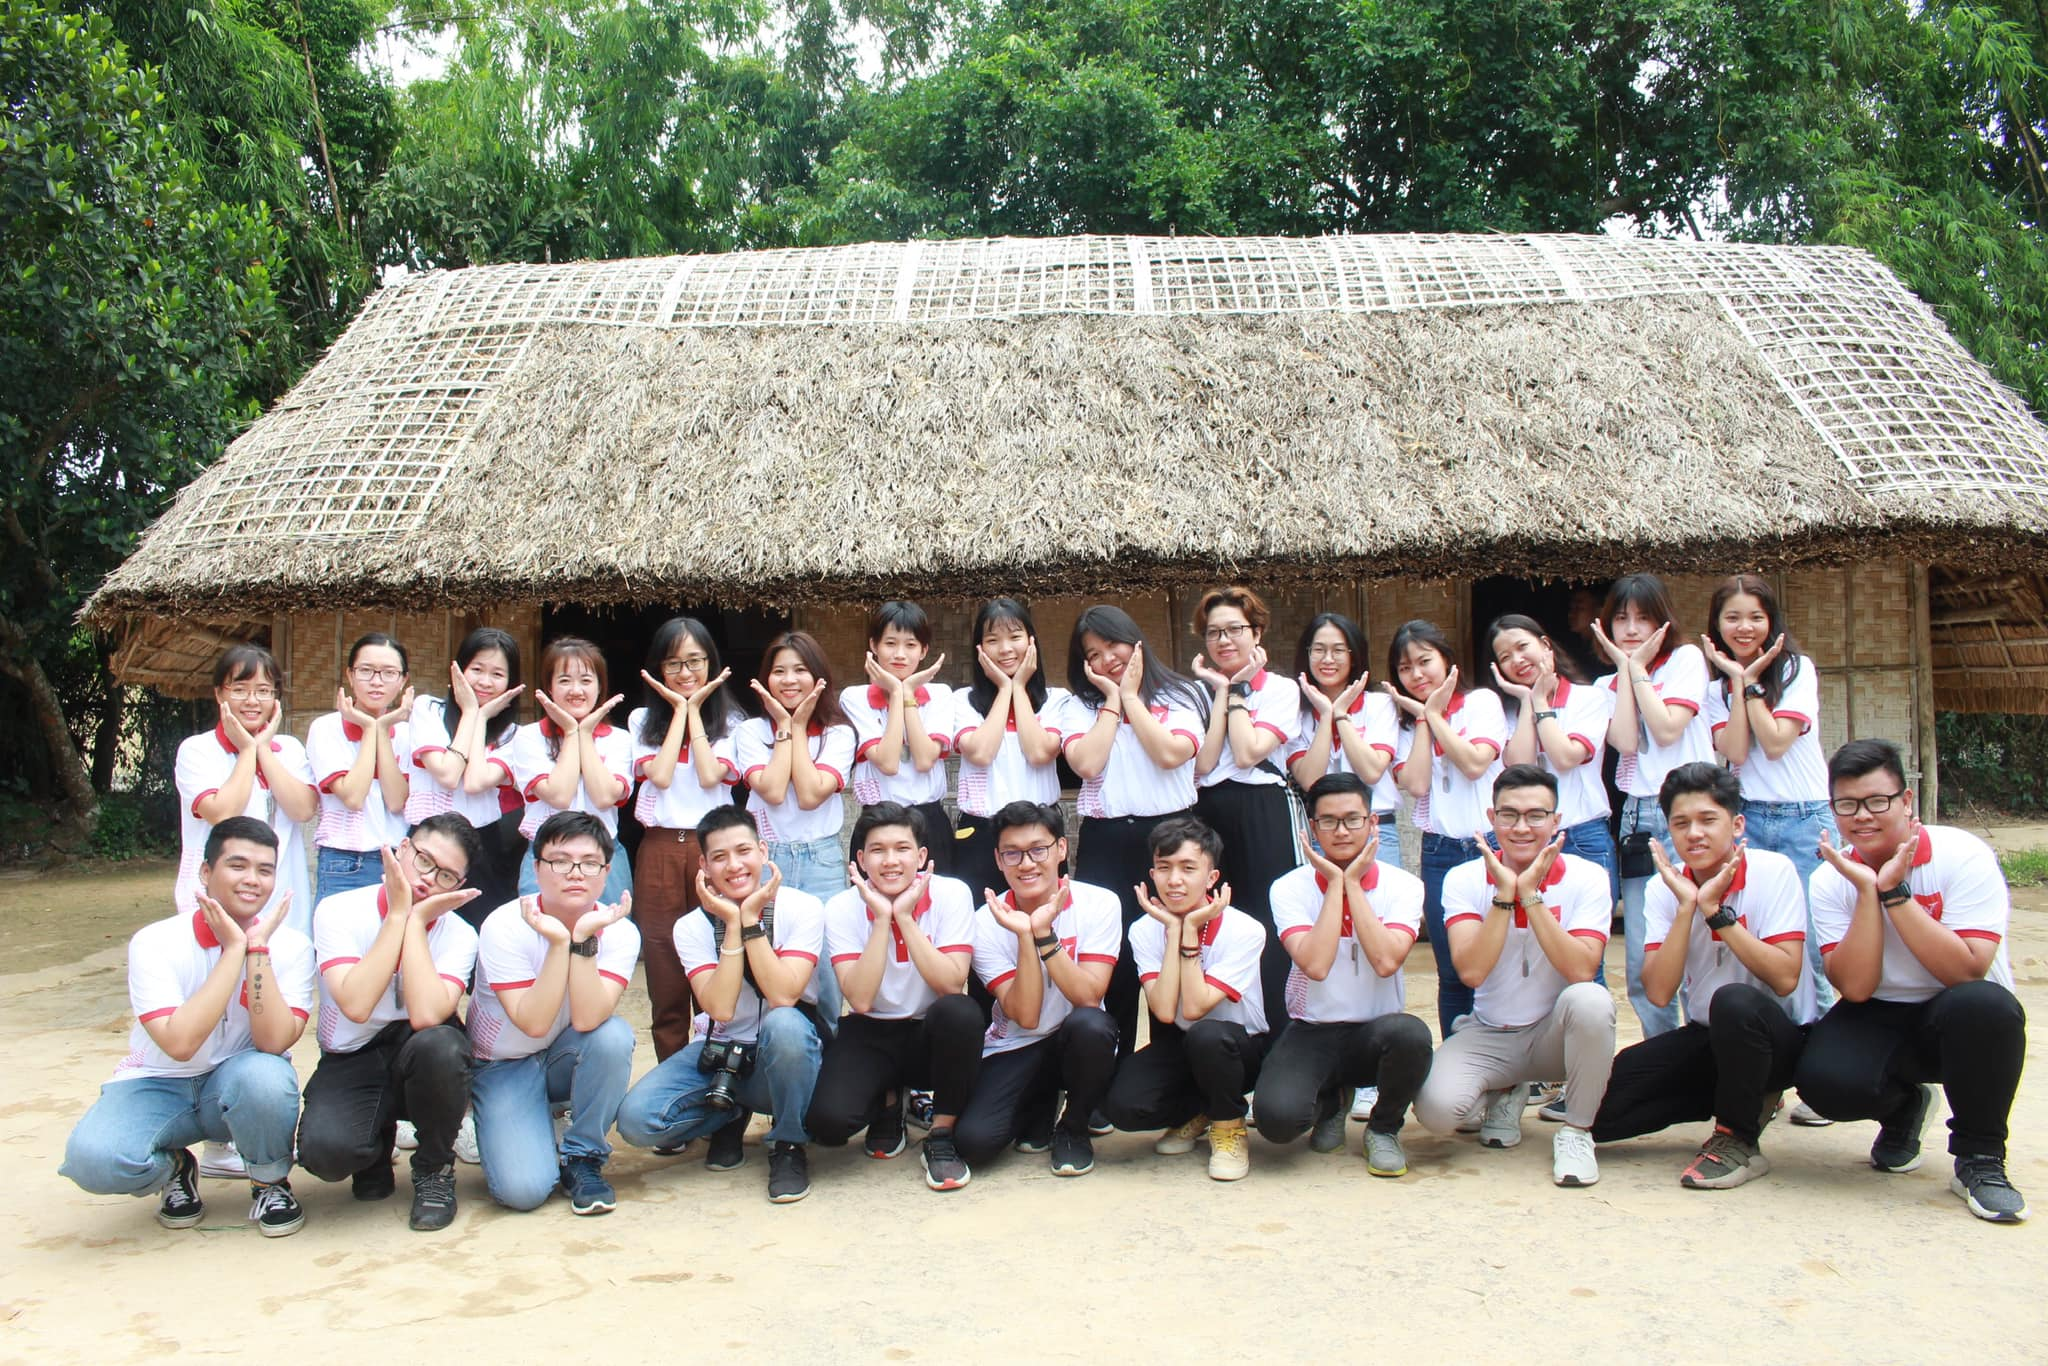 vlu hanh trinh tham den hung 2019 i